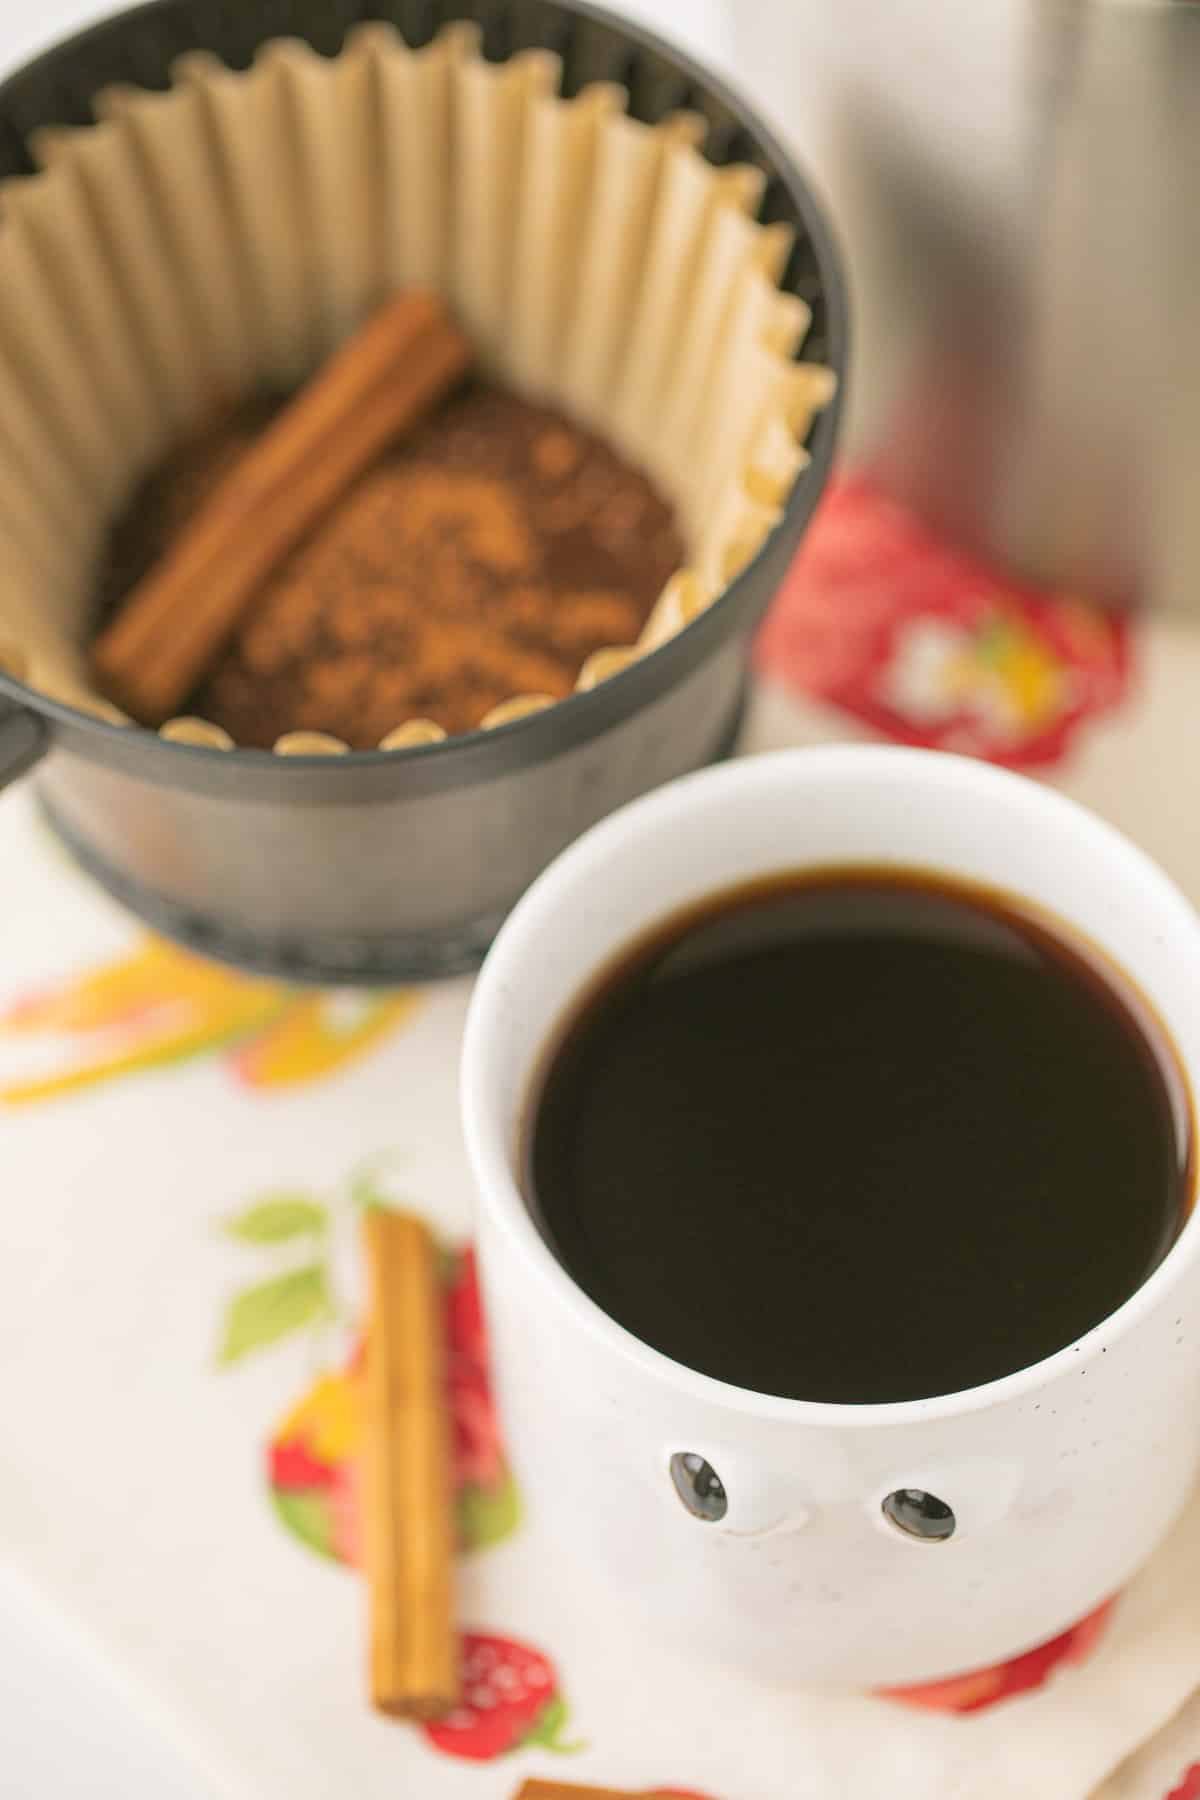 pumpkin spice coffee in a white mug next to cinnamon sticks